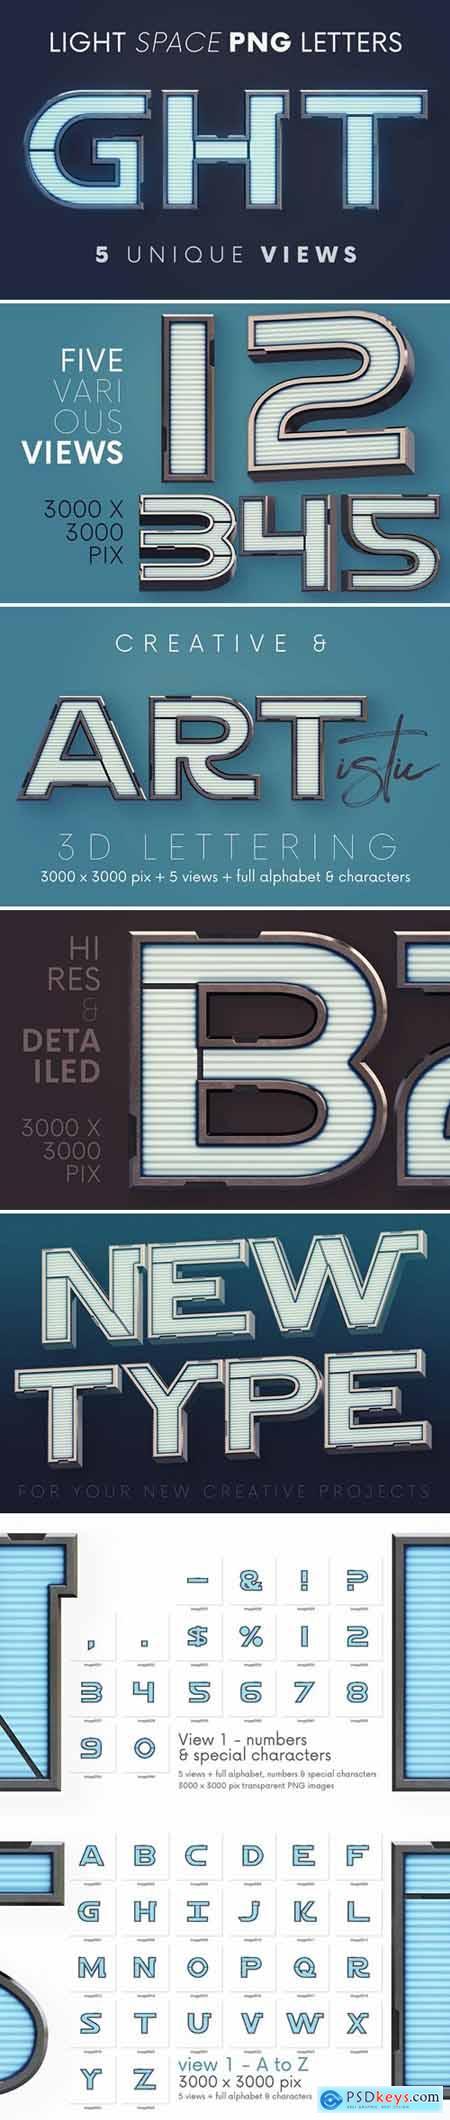 Light Space - 3D Lettering